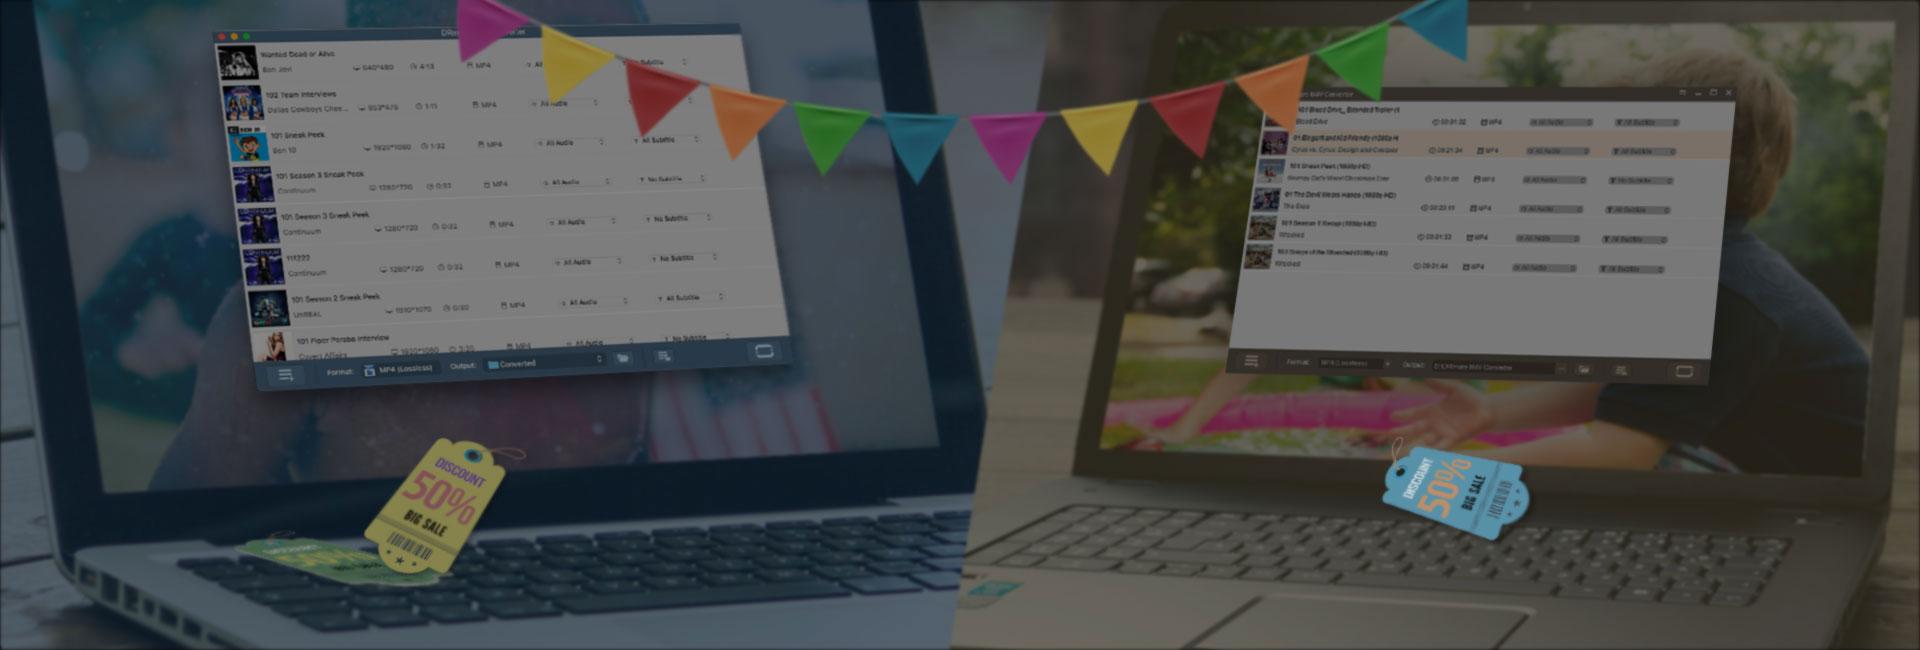 DRmare M4V Converte for Mac 2.1.2 破解版 – iTunes M4V视频格式转换工具-爱情守望者